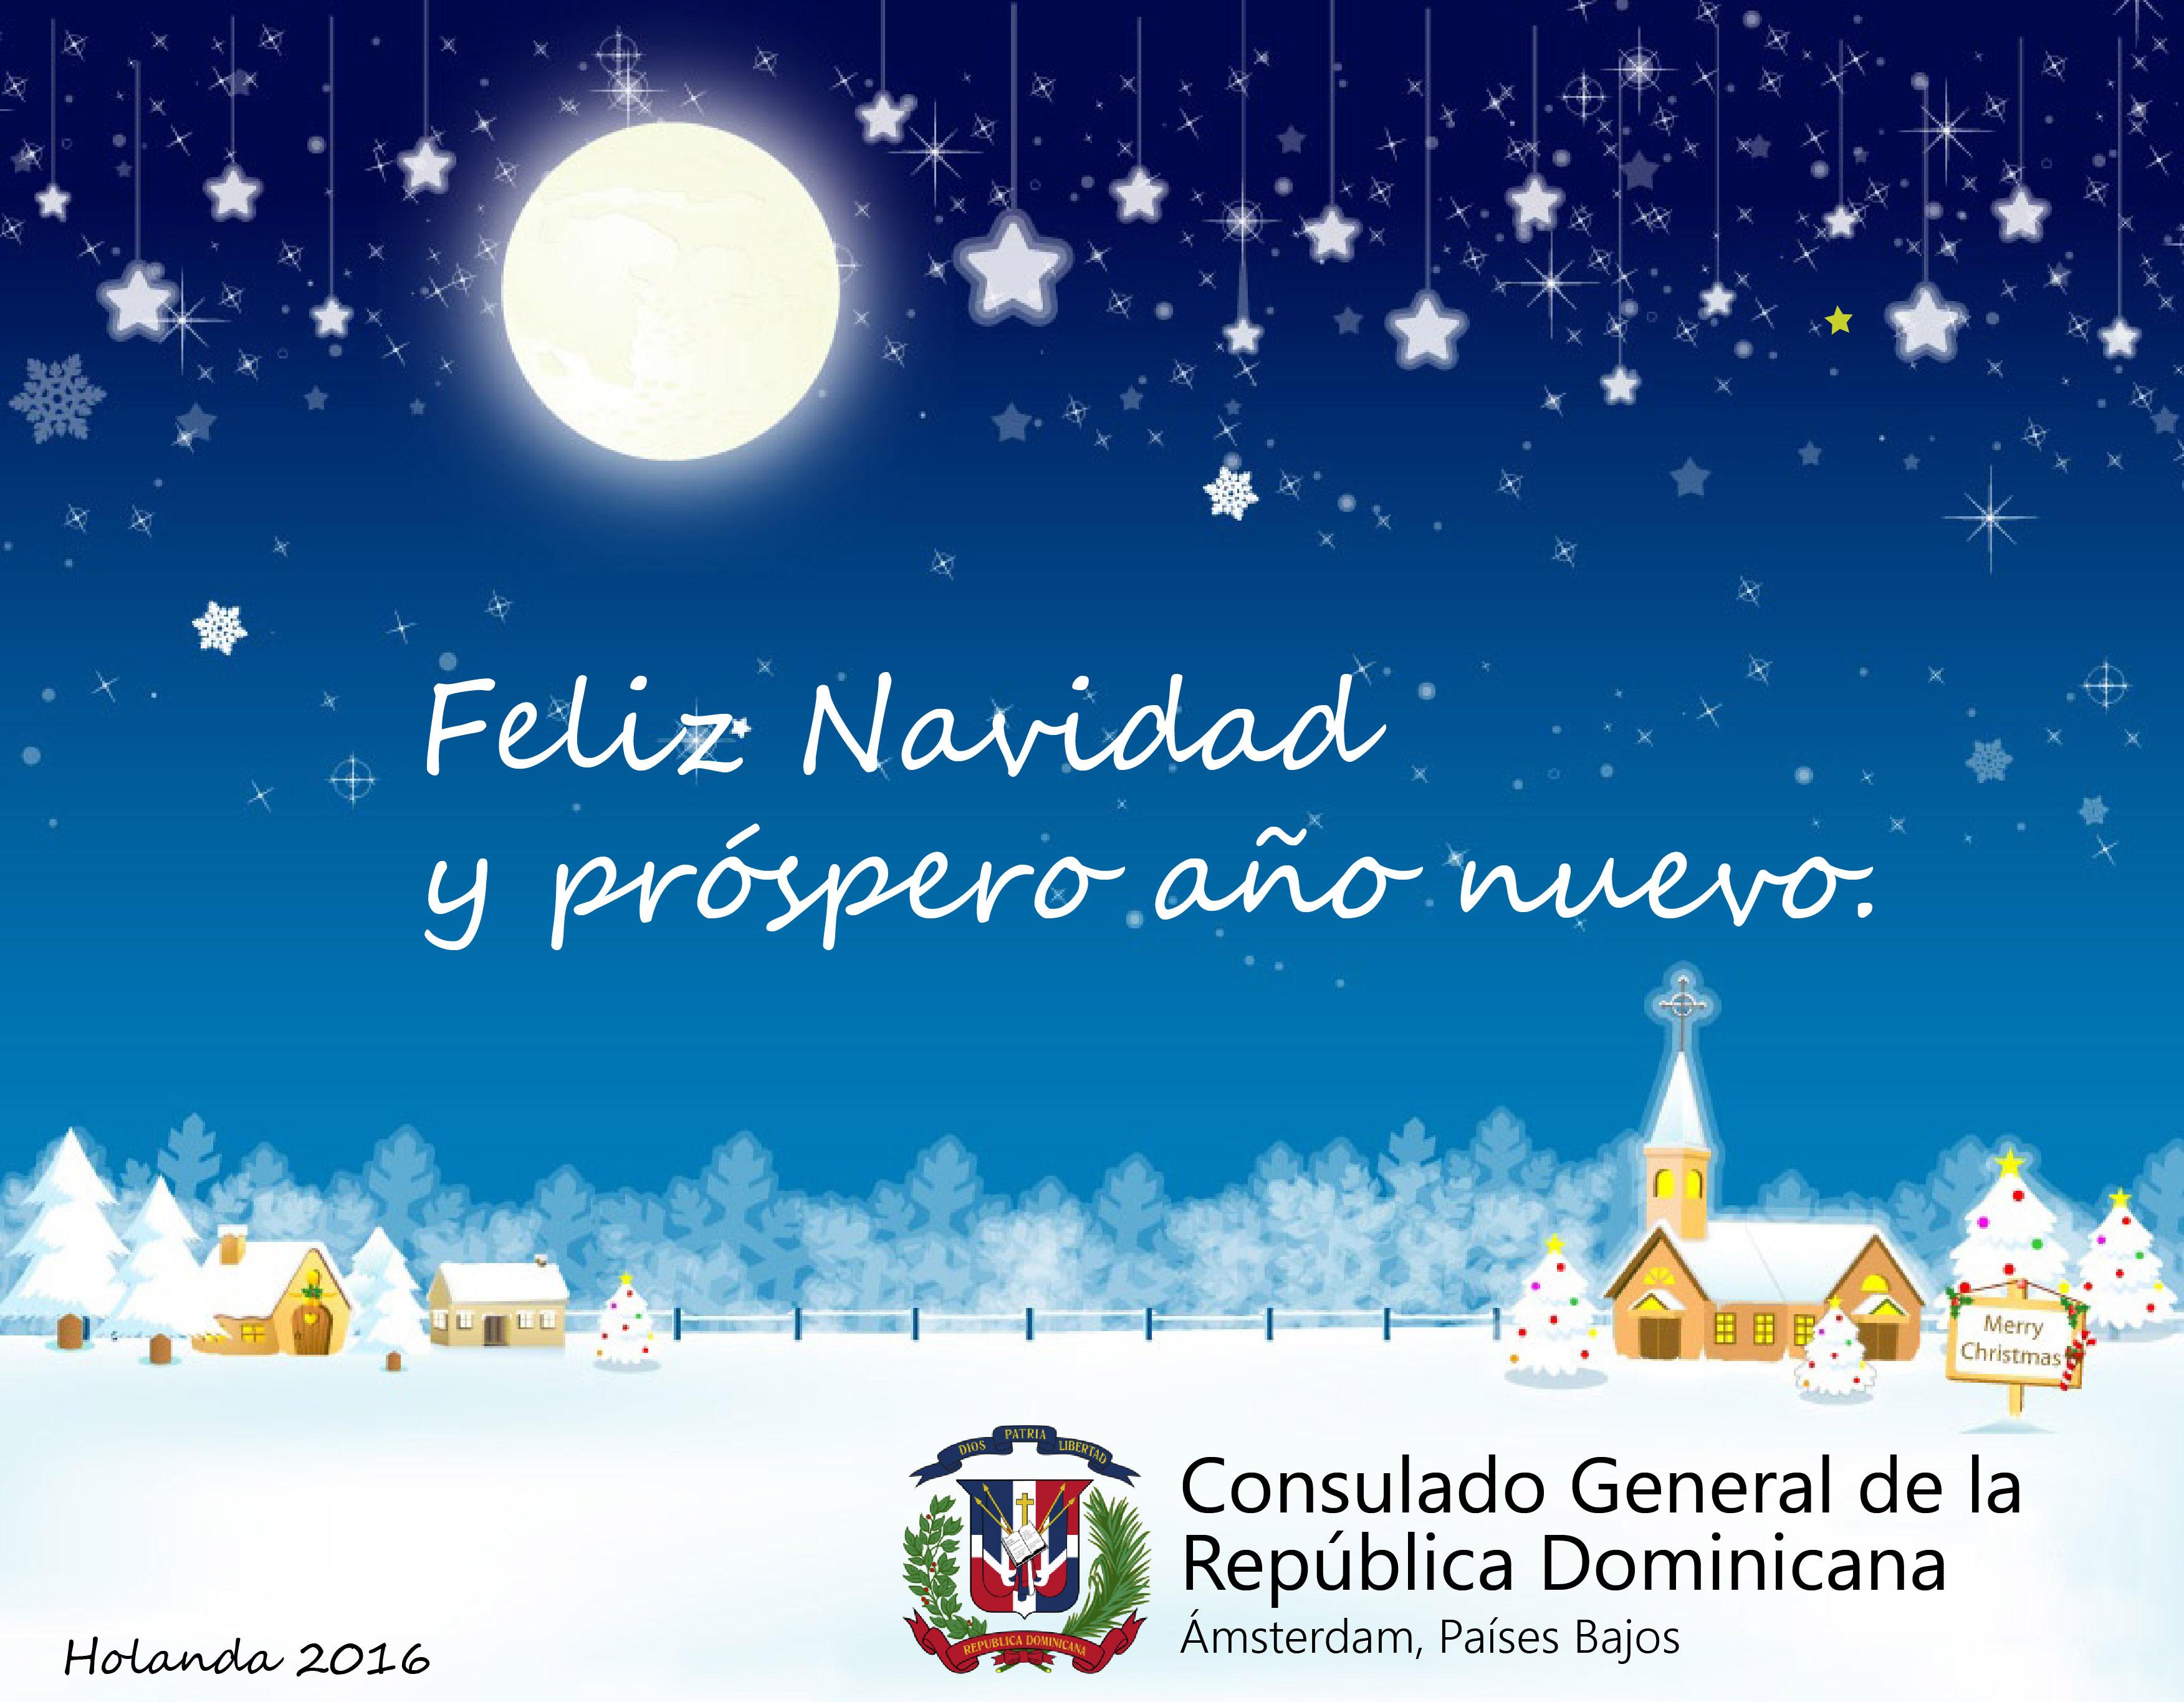 Consulado RD Holanda - Tarjeta de navidad 2016